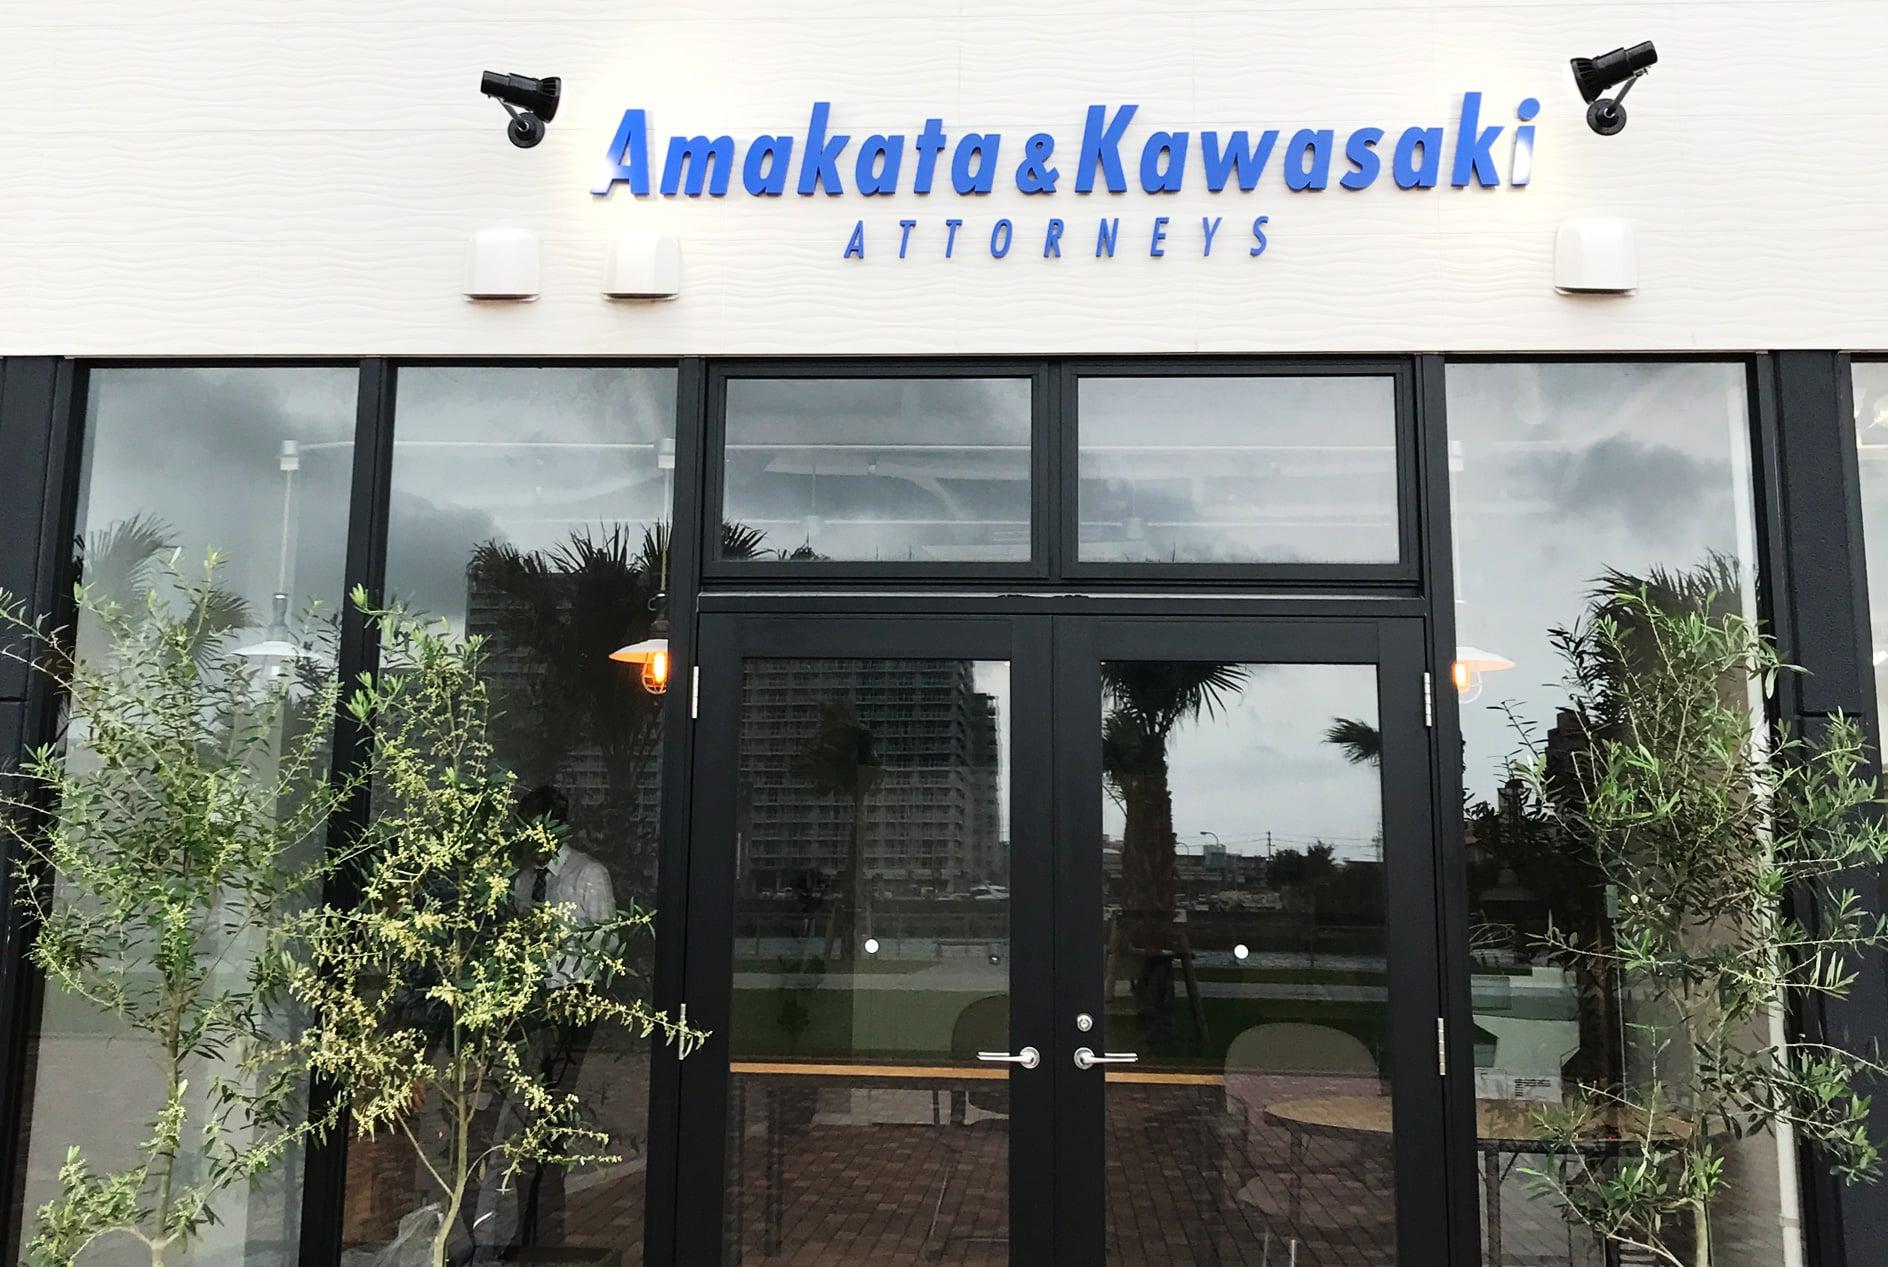 Amakata & Kawasaki